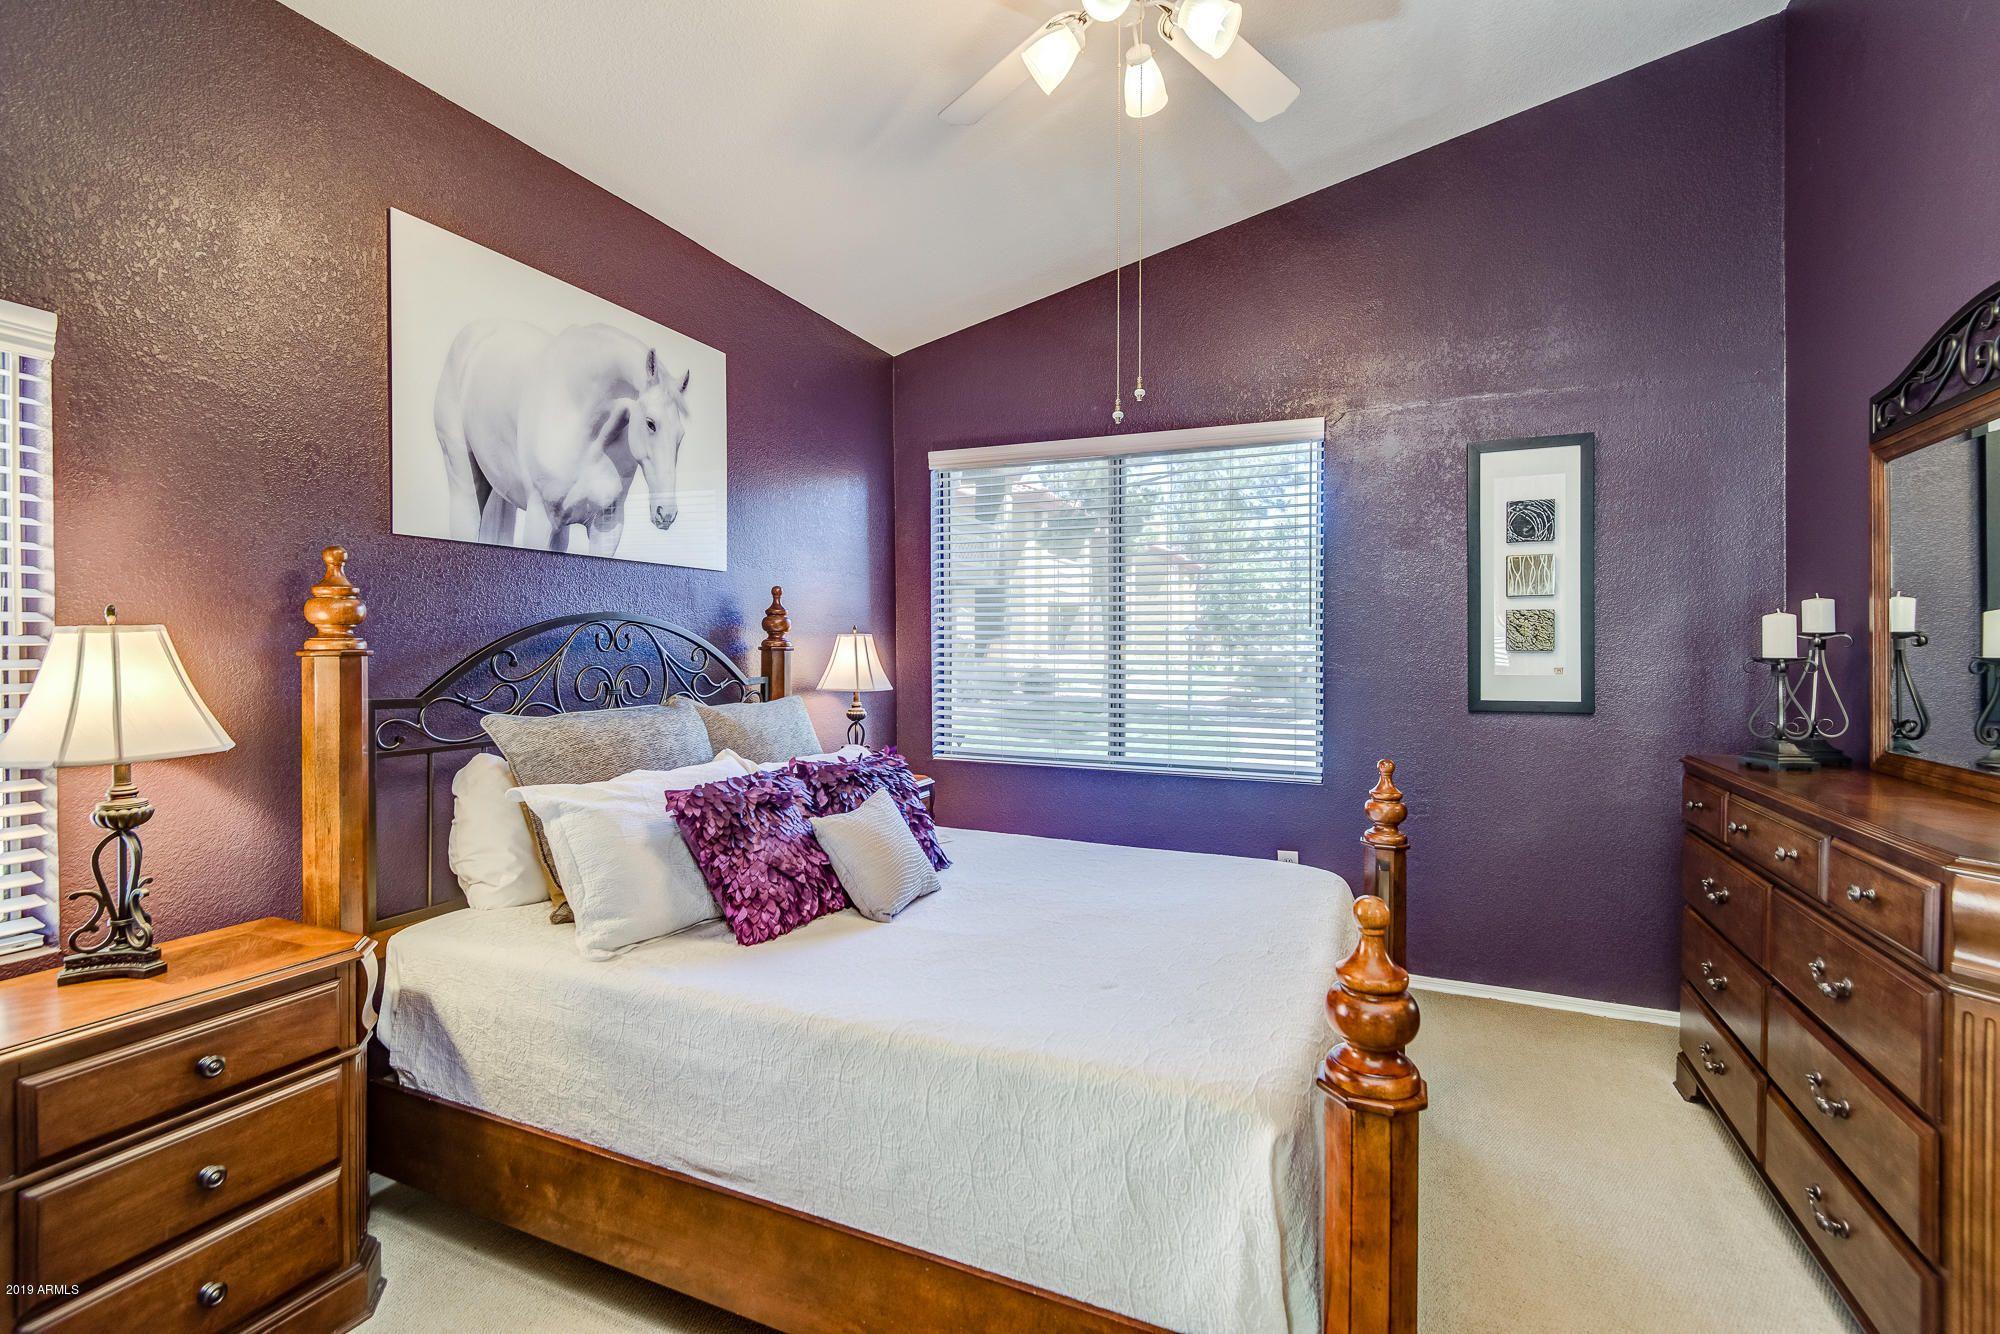 Master Bedroom Staging Ideas Home staging, Model homes